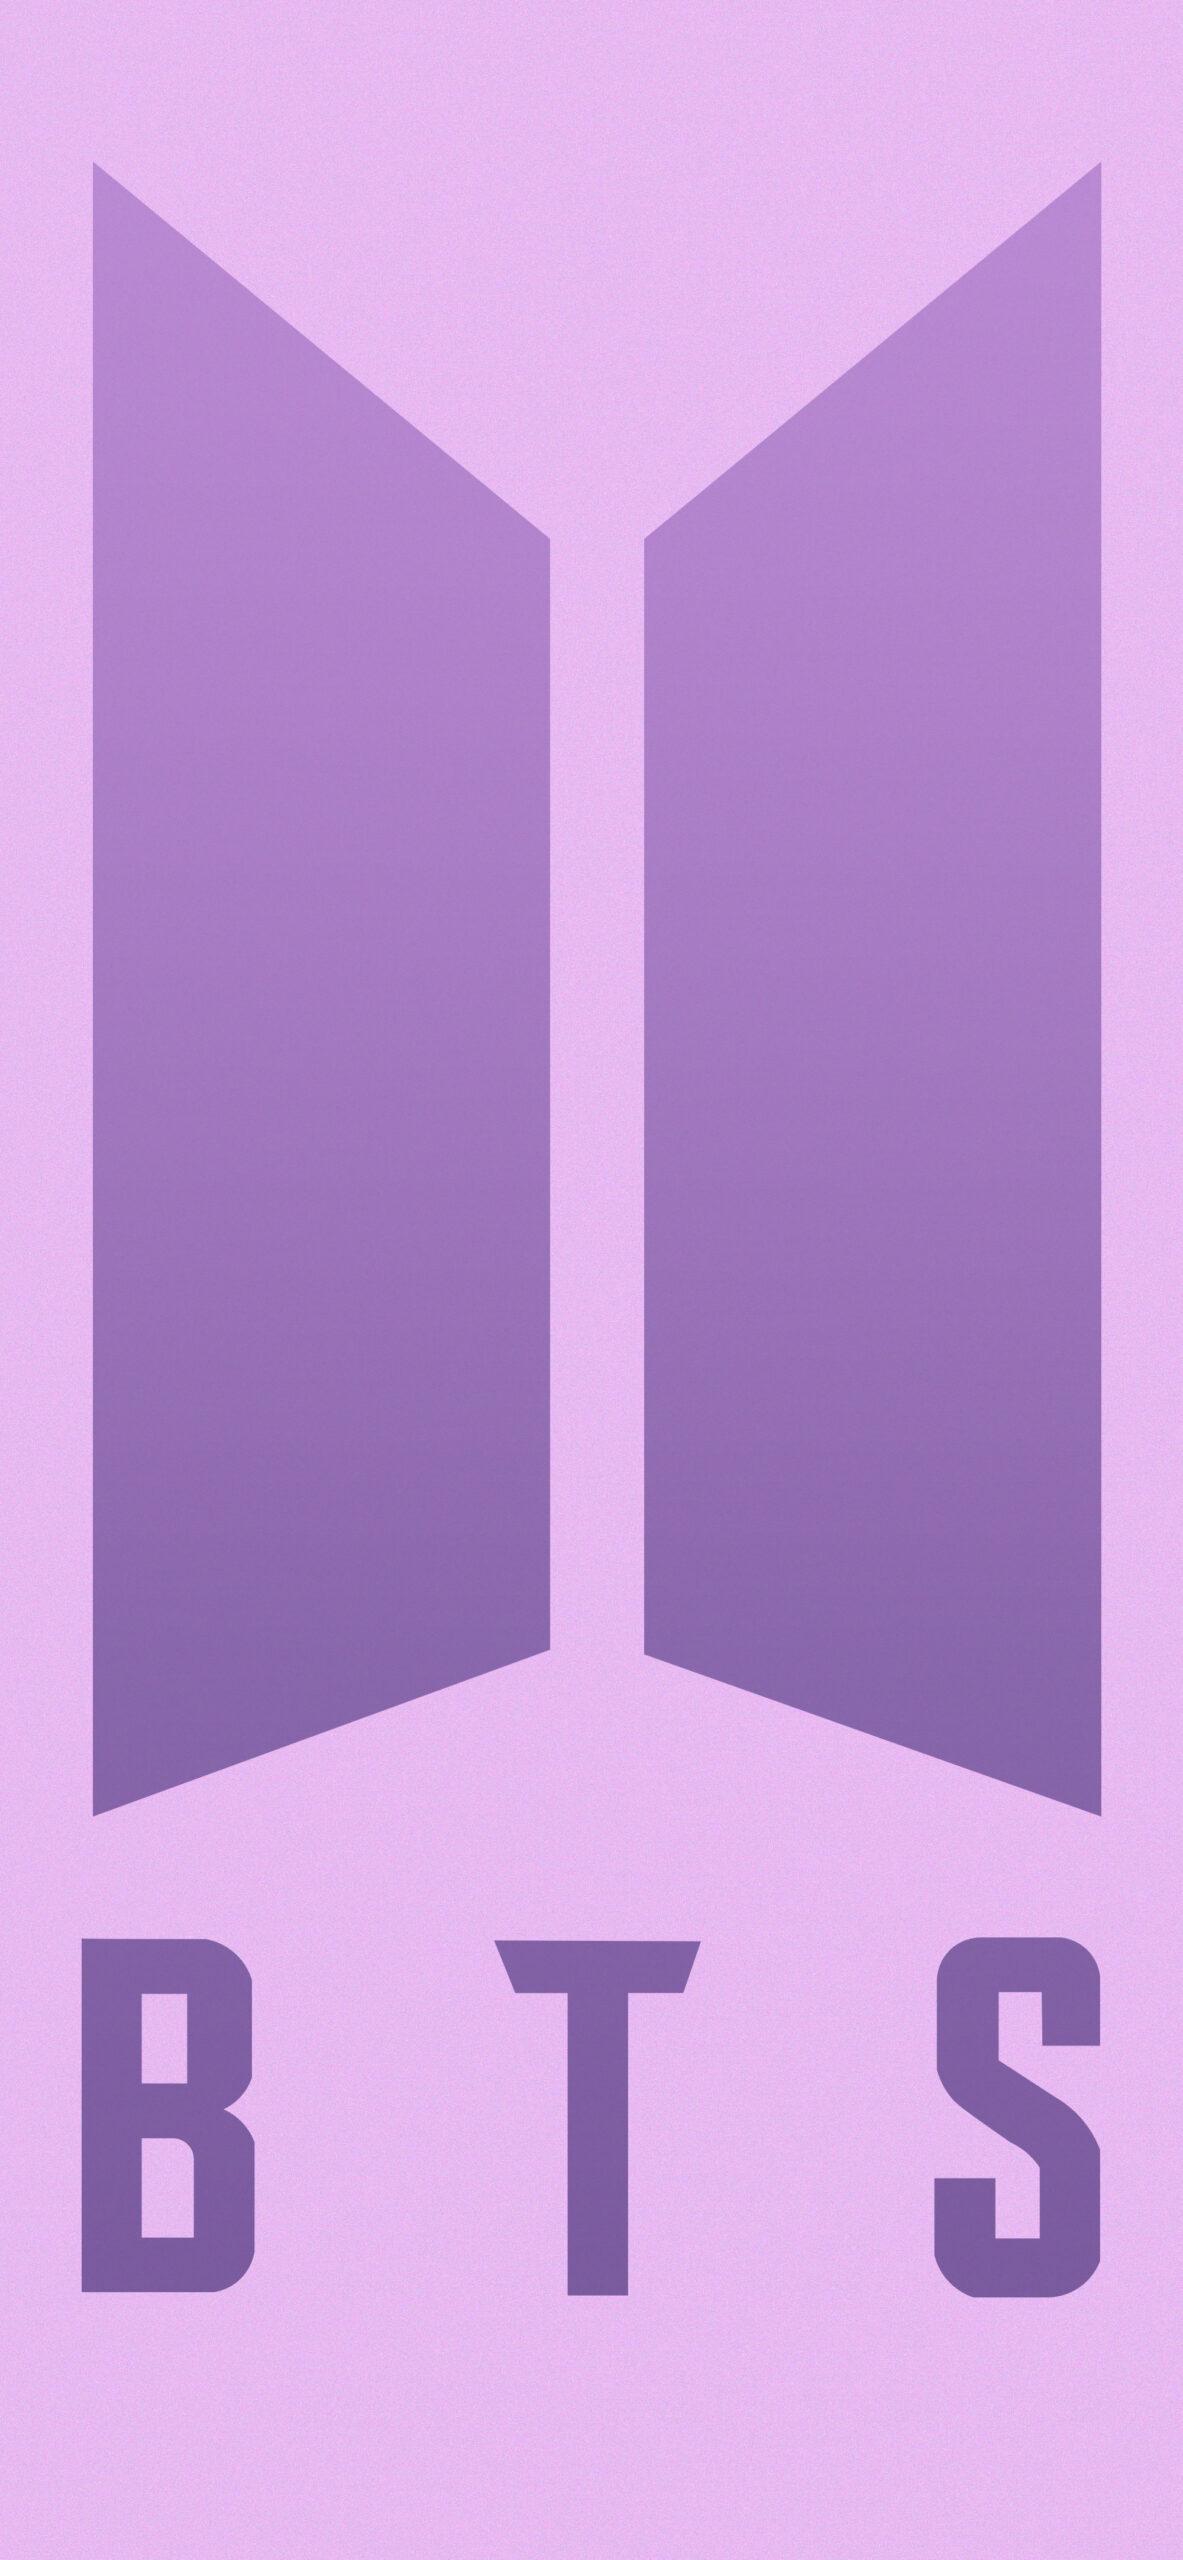 bts bt21 mang purple background